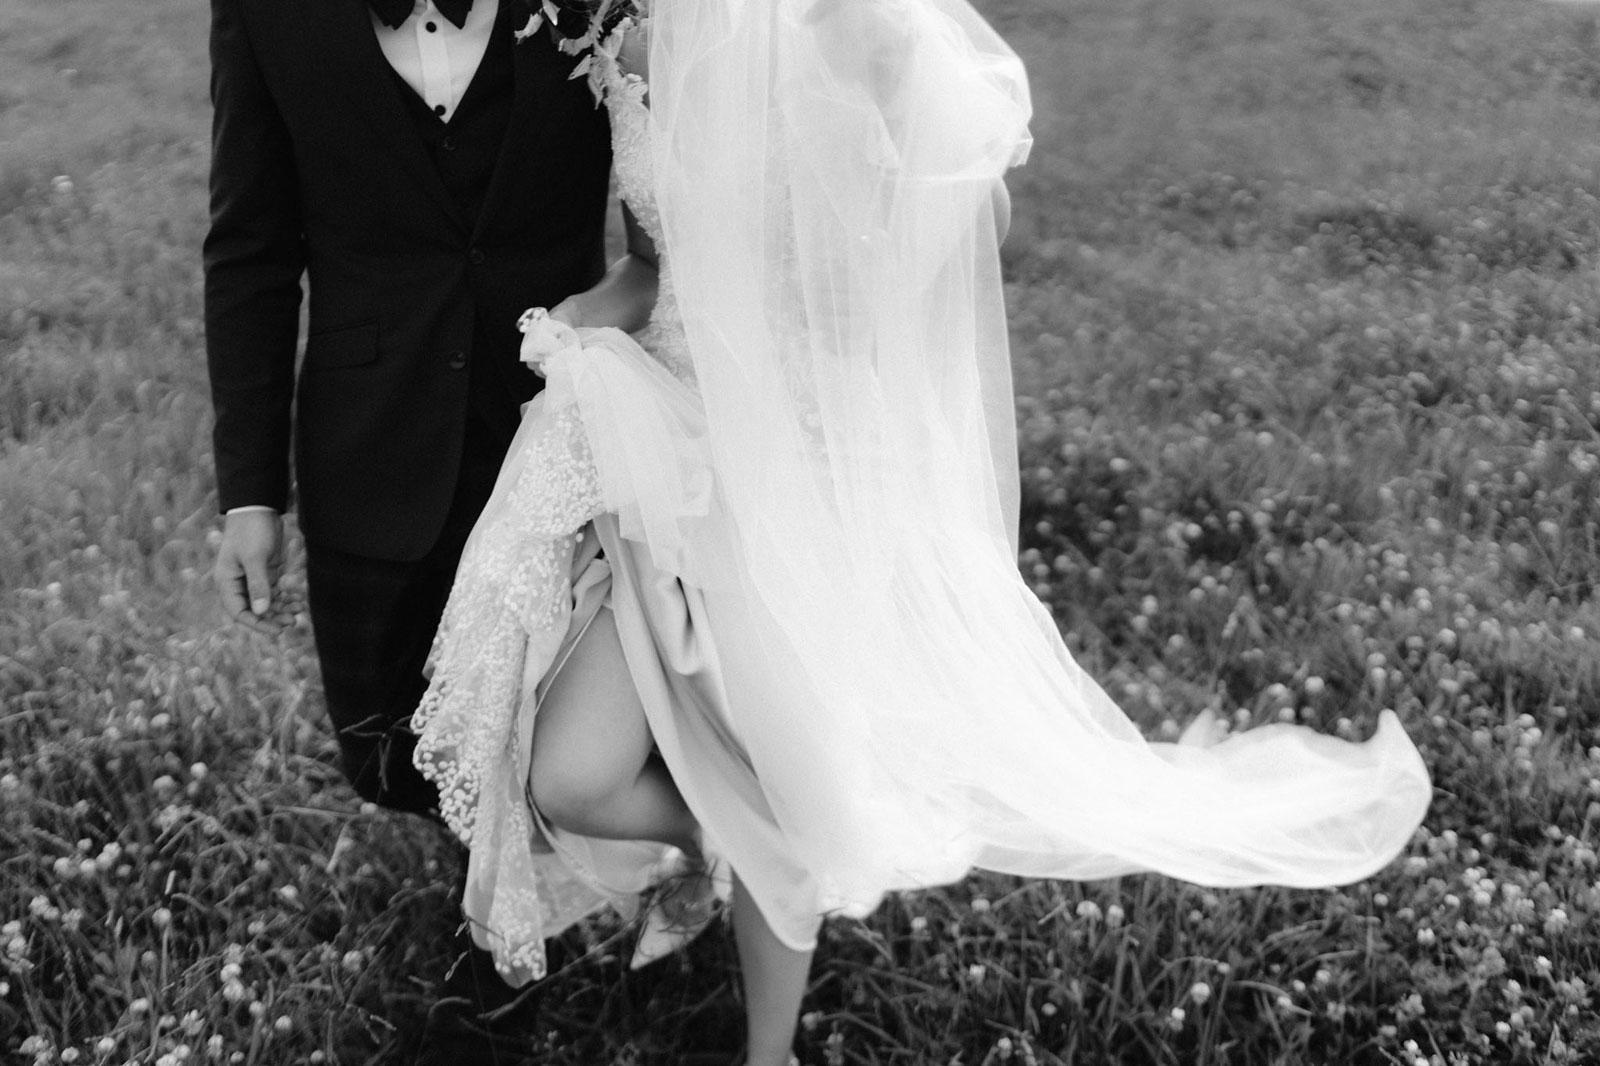 newfound-n-c-olive-tree-cottage-tauranga-wedding-photographer-702